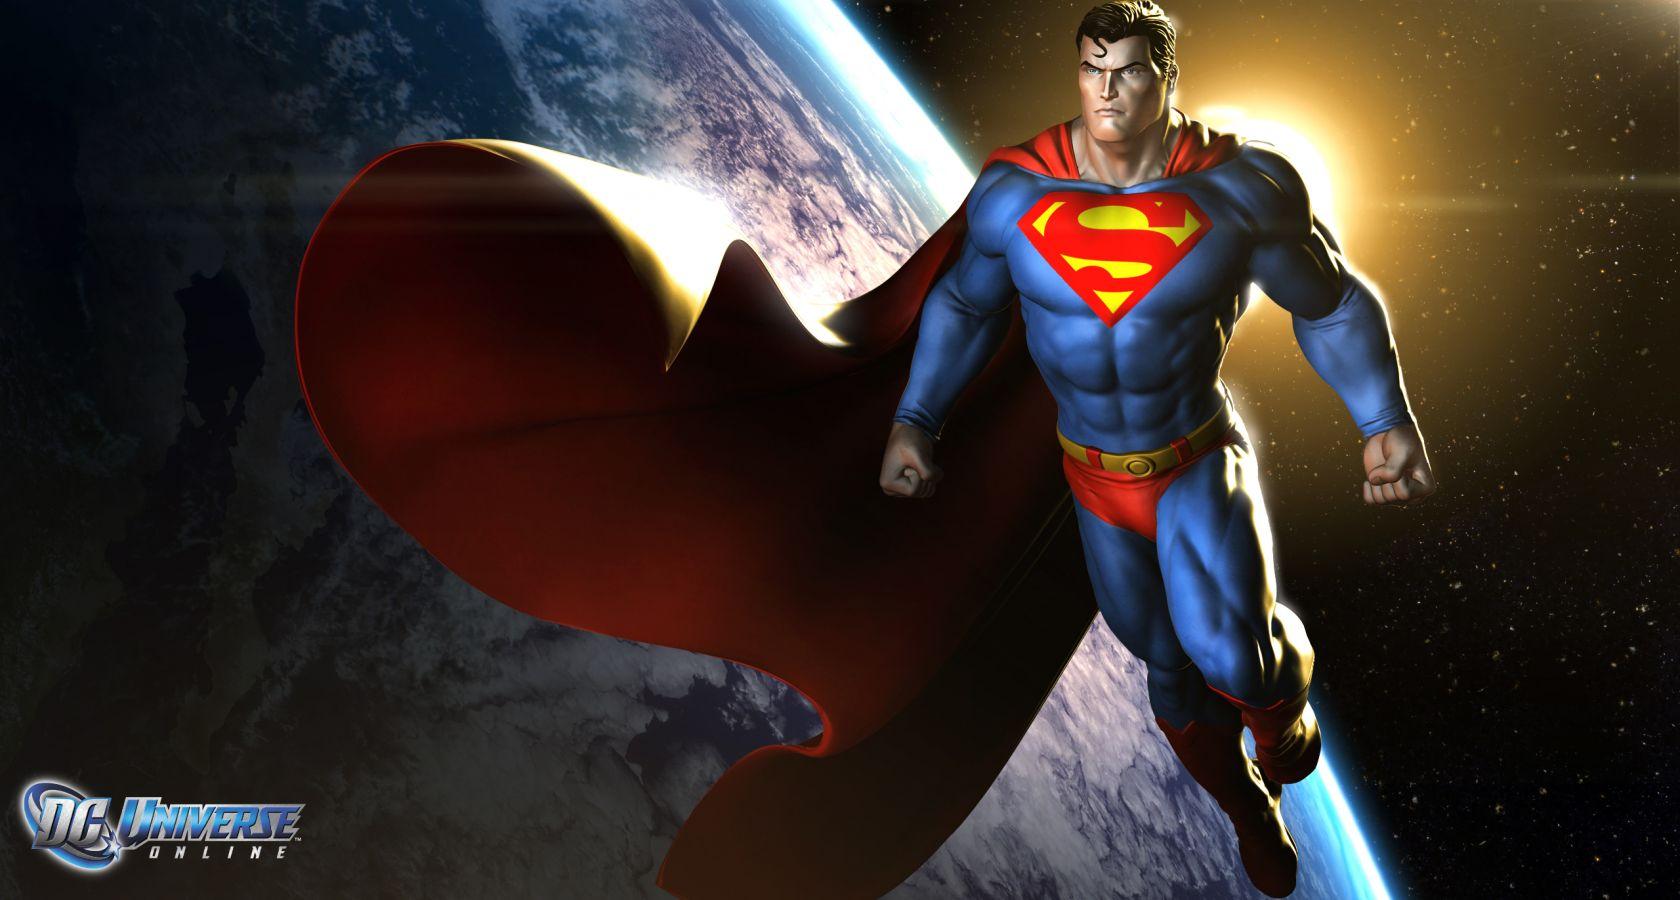 Superman 3D Wallpaper Wallpapers Gratis   Imagenes  Paisajes 1680x900